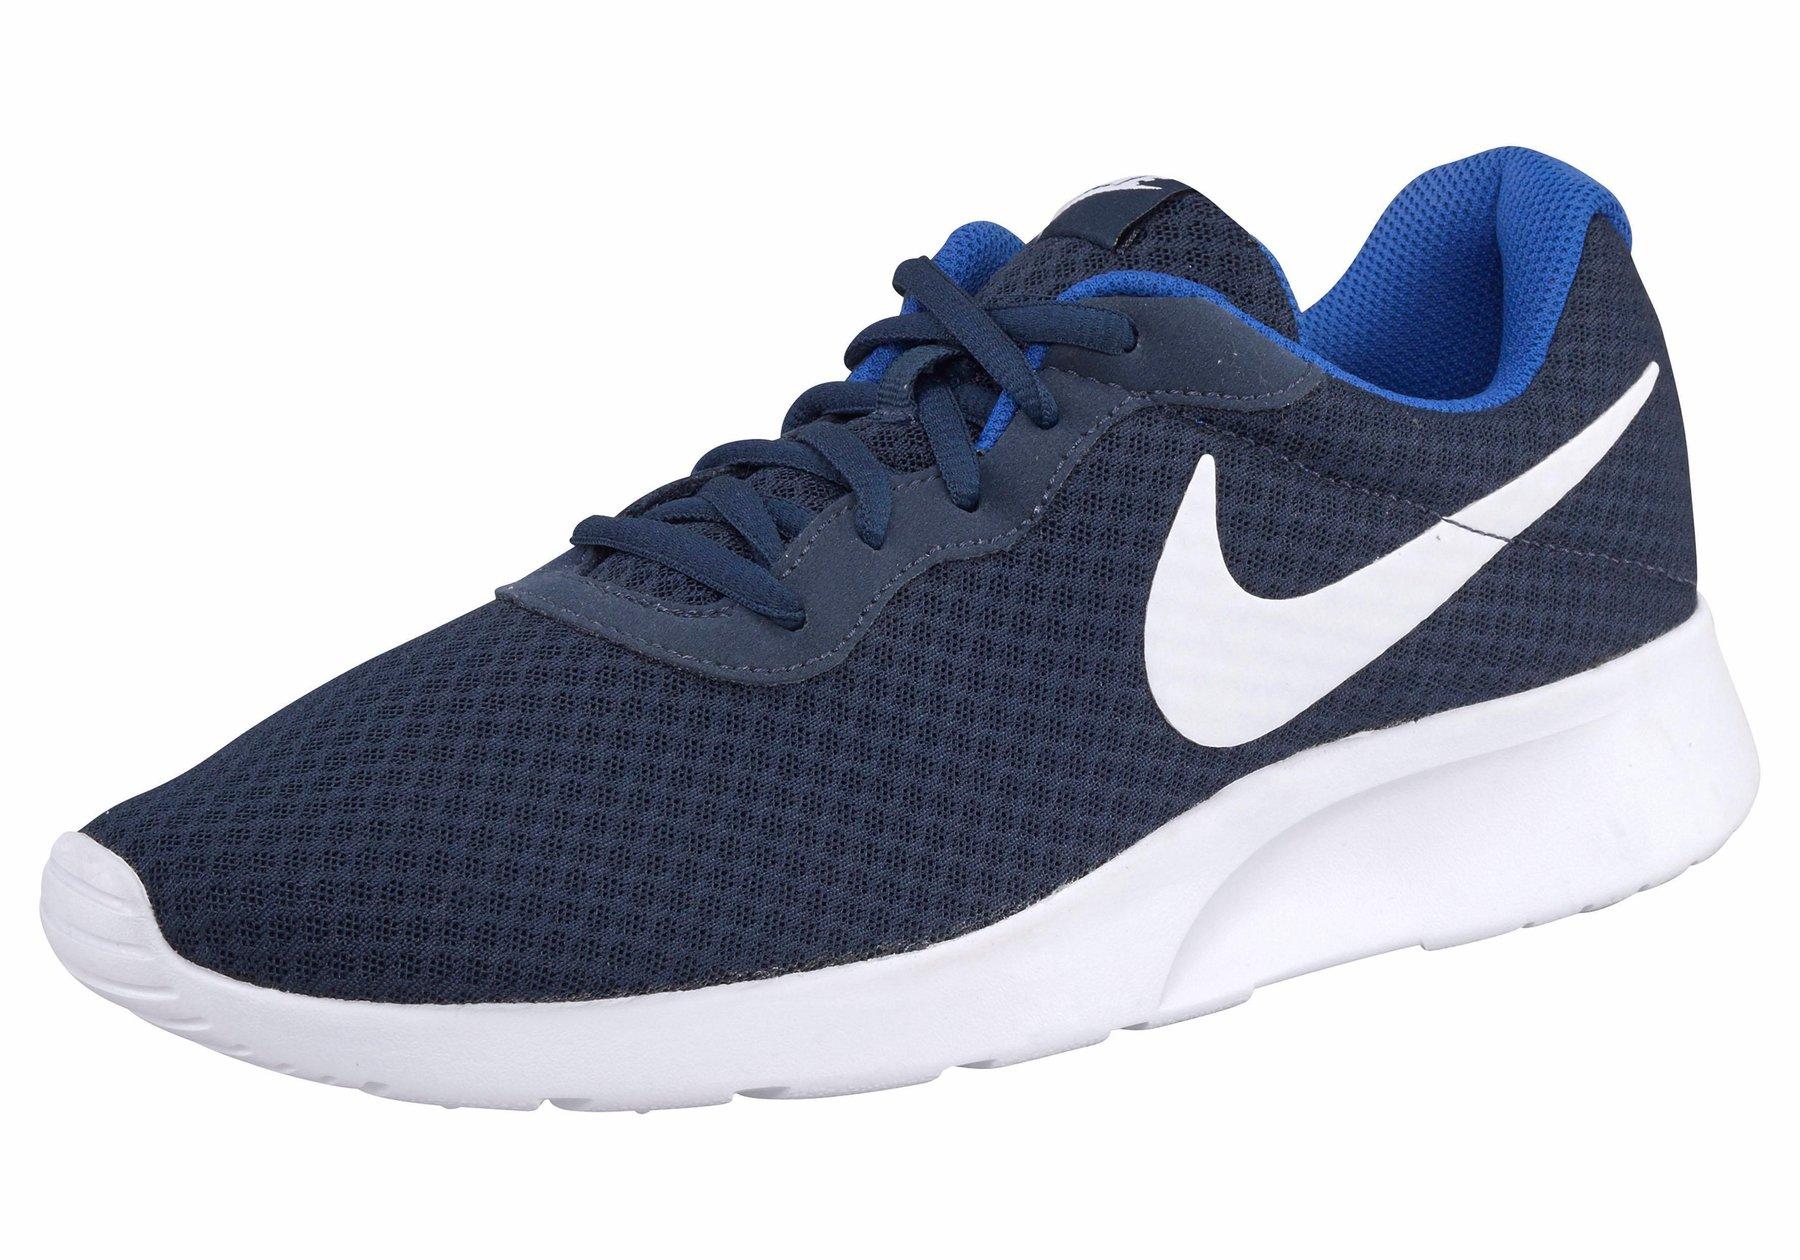 909cb46d761c28 Nike Tanjun günstig online kaufen - bereits ab 34